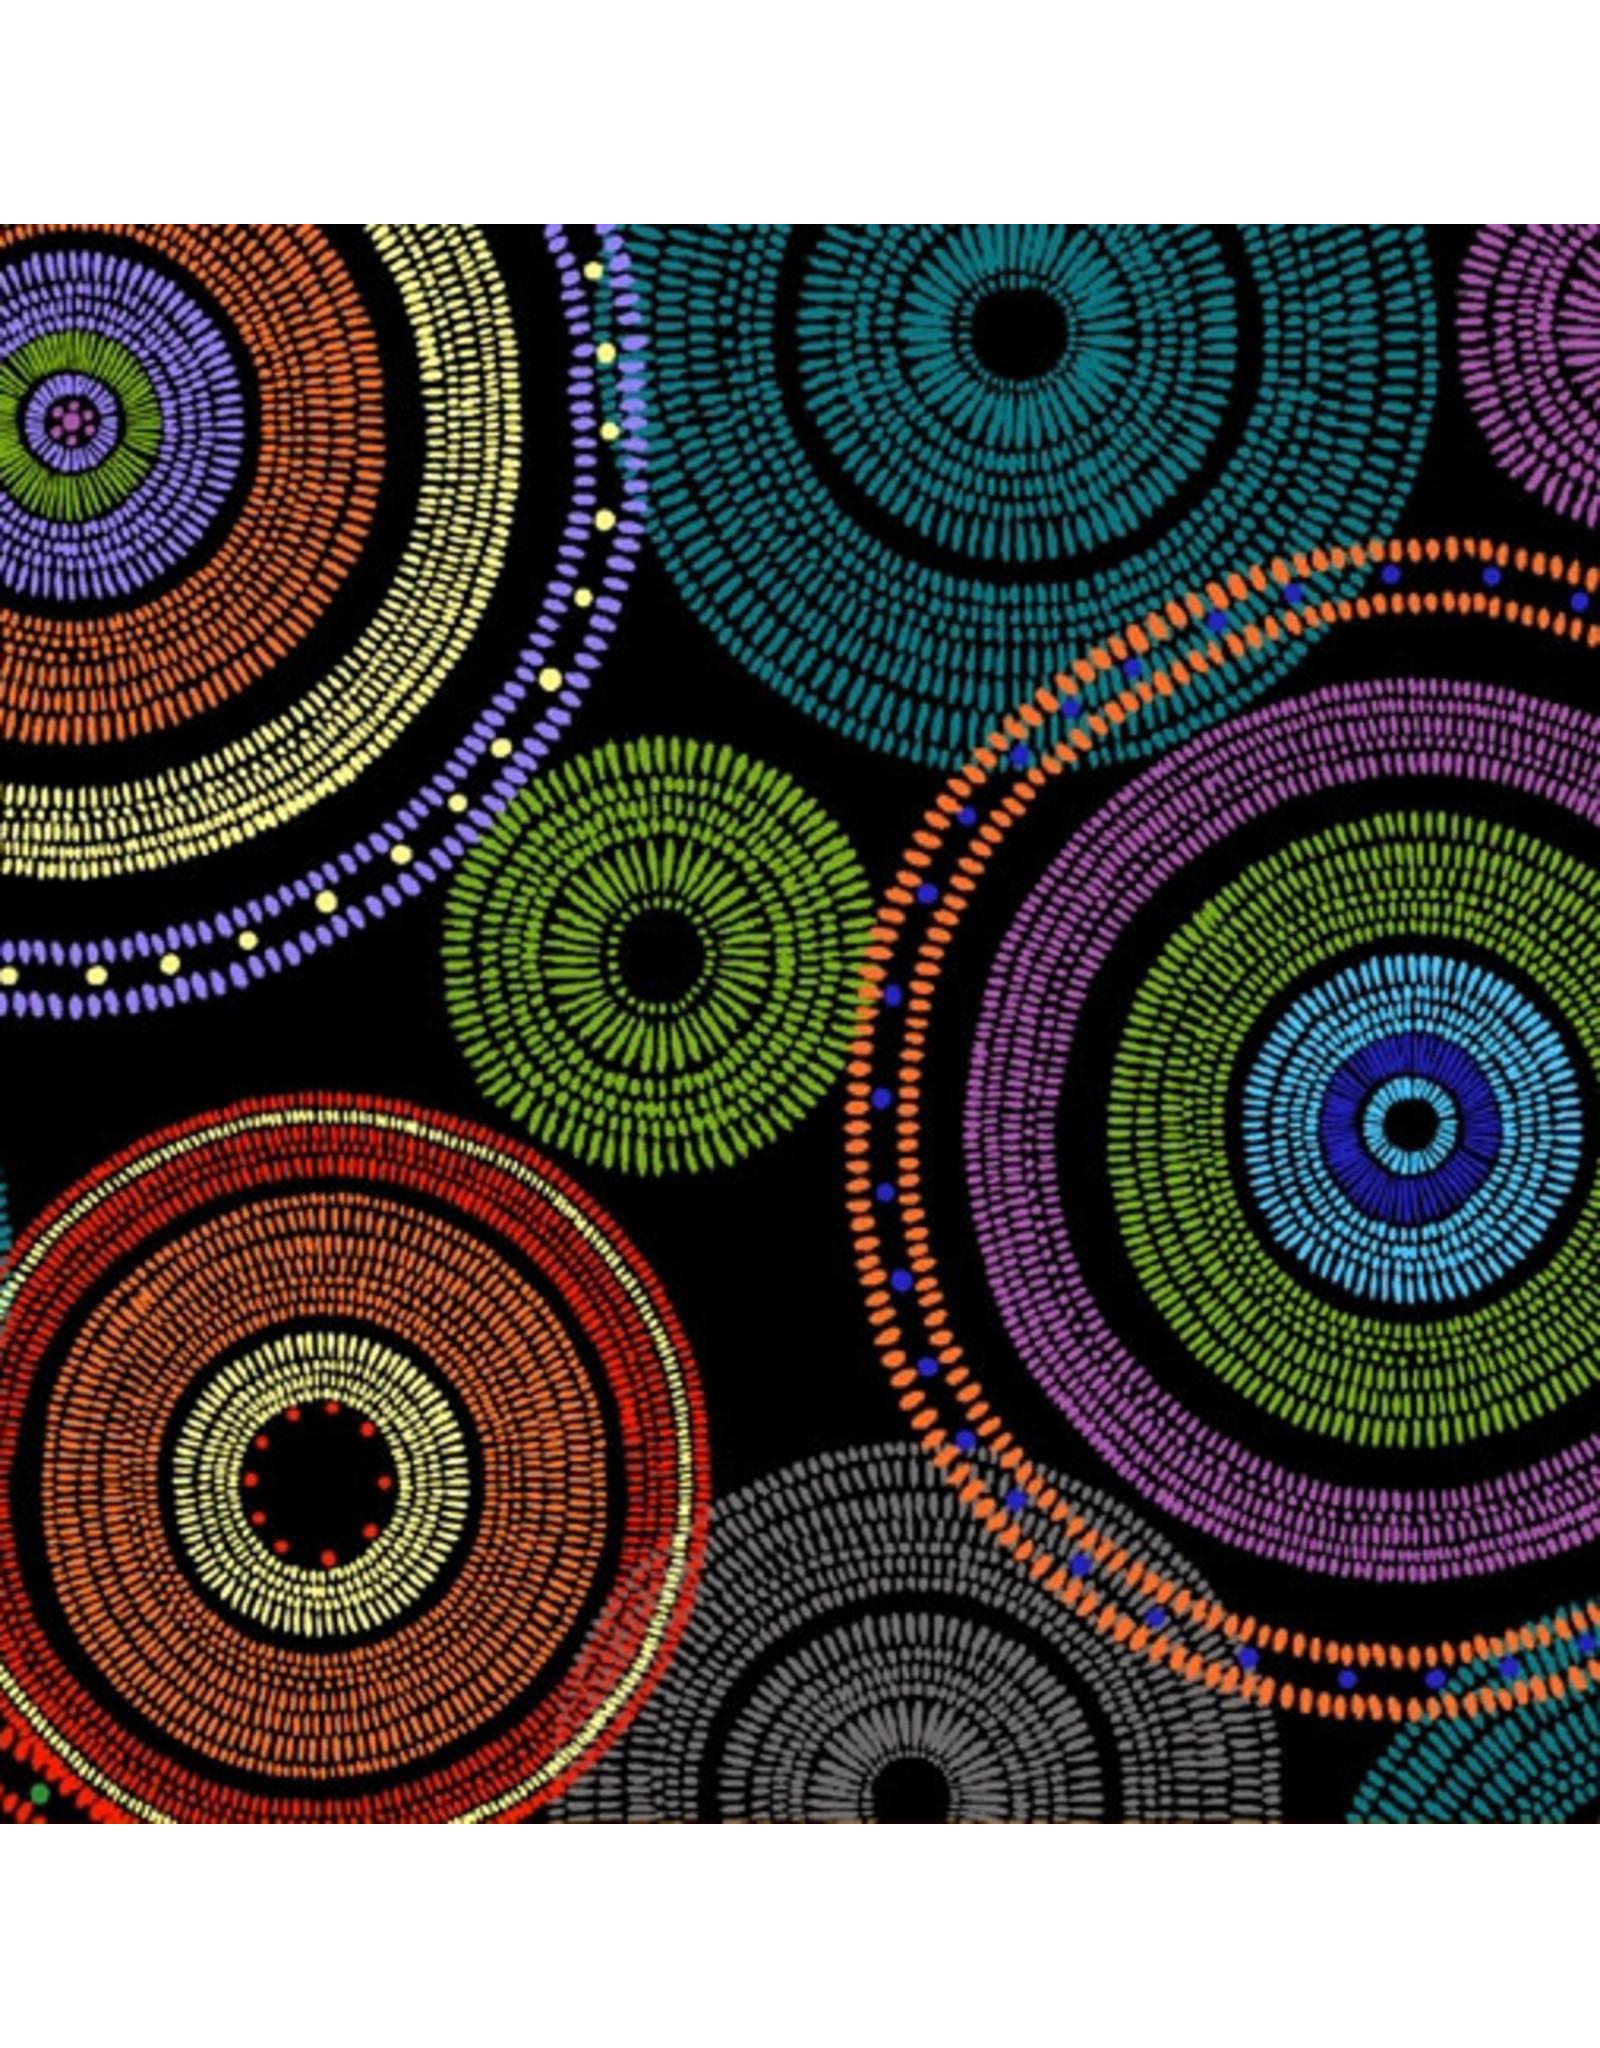 Windham Fabrics 108 Quilt Backs, Medallion in Black Multi, Fabric Half-Yards